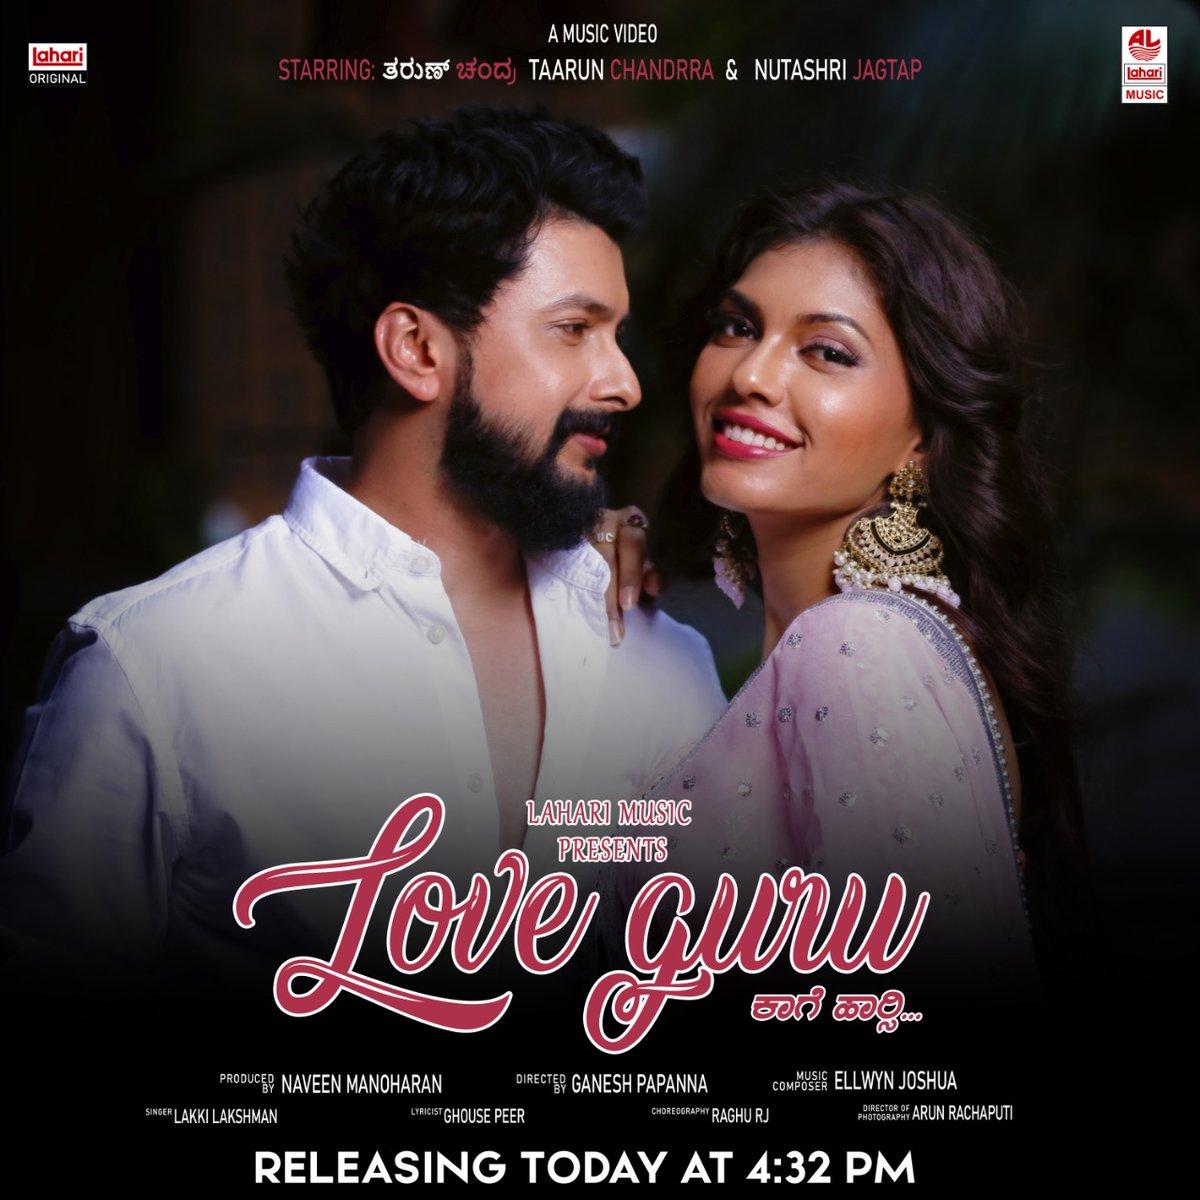 #LoveGuru - A #LahariOriginal Released today at 04:32 PM only on #LahariMusic  @TAARUNCHANDRRA #NutashriJagtap #ganeshpapanna #rakfocusfilms #RaghuRj #LakkiLakshman @LahariMusic